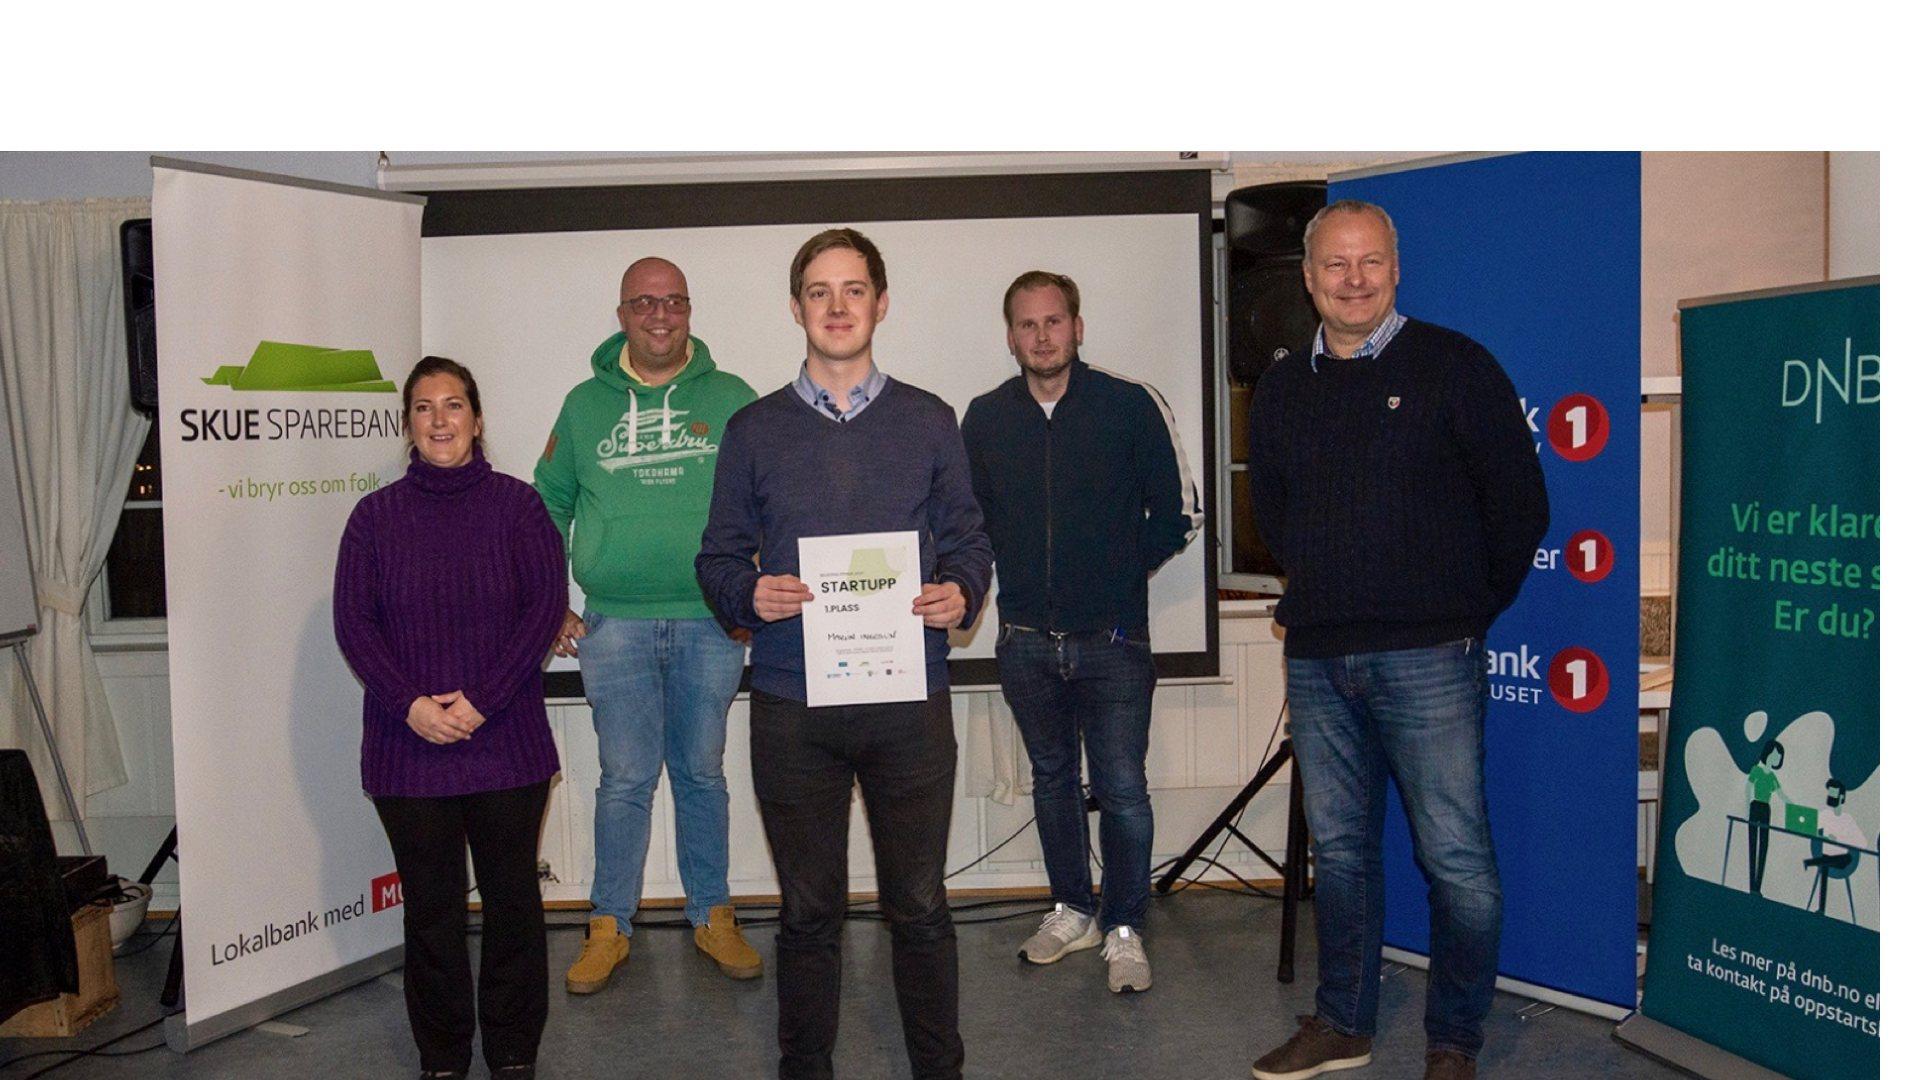 Martin vant delfinalen i Startupp